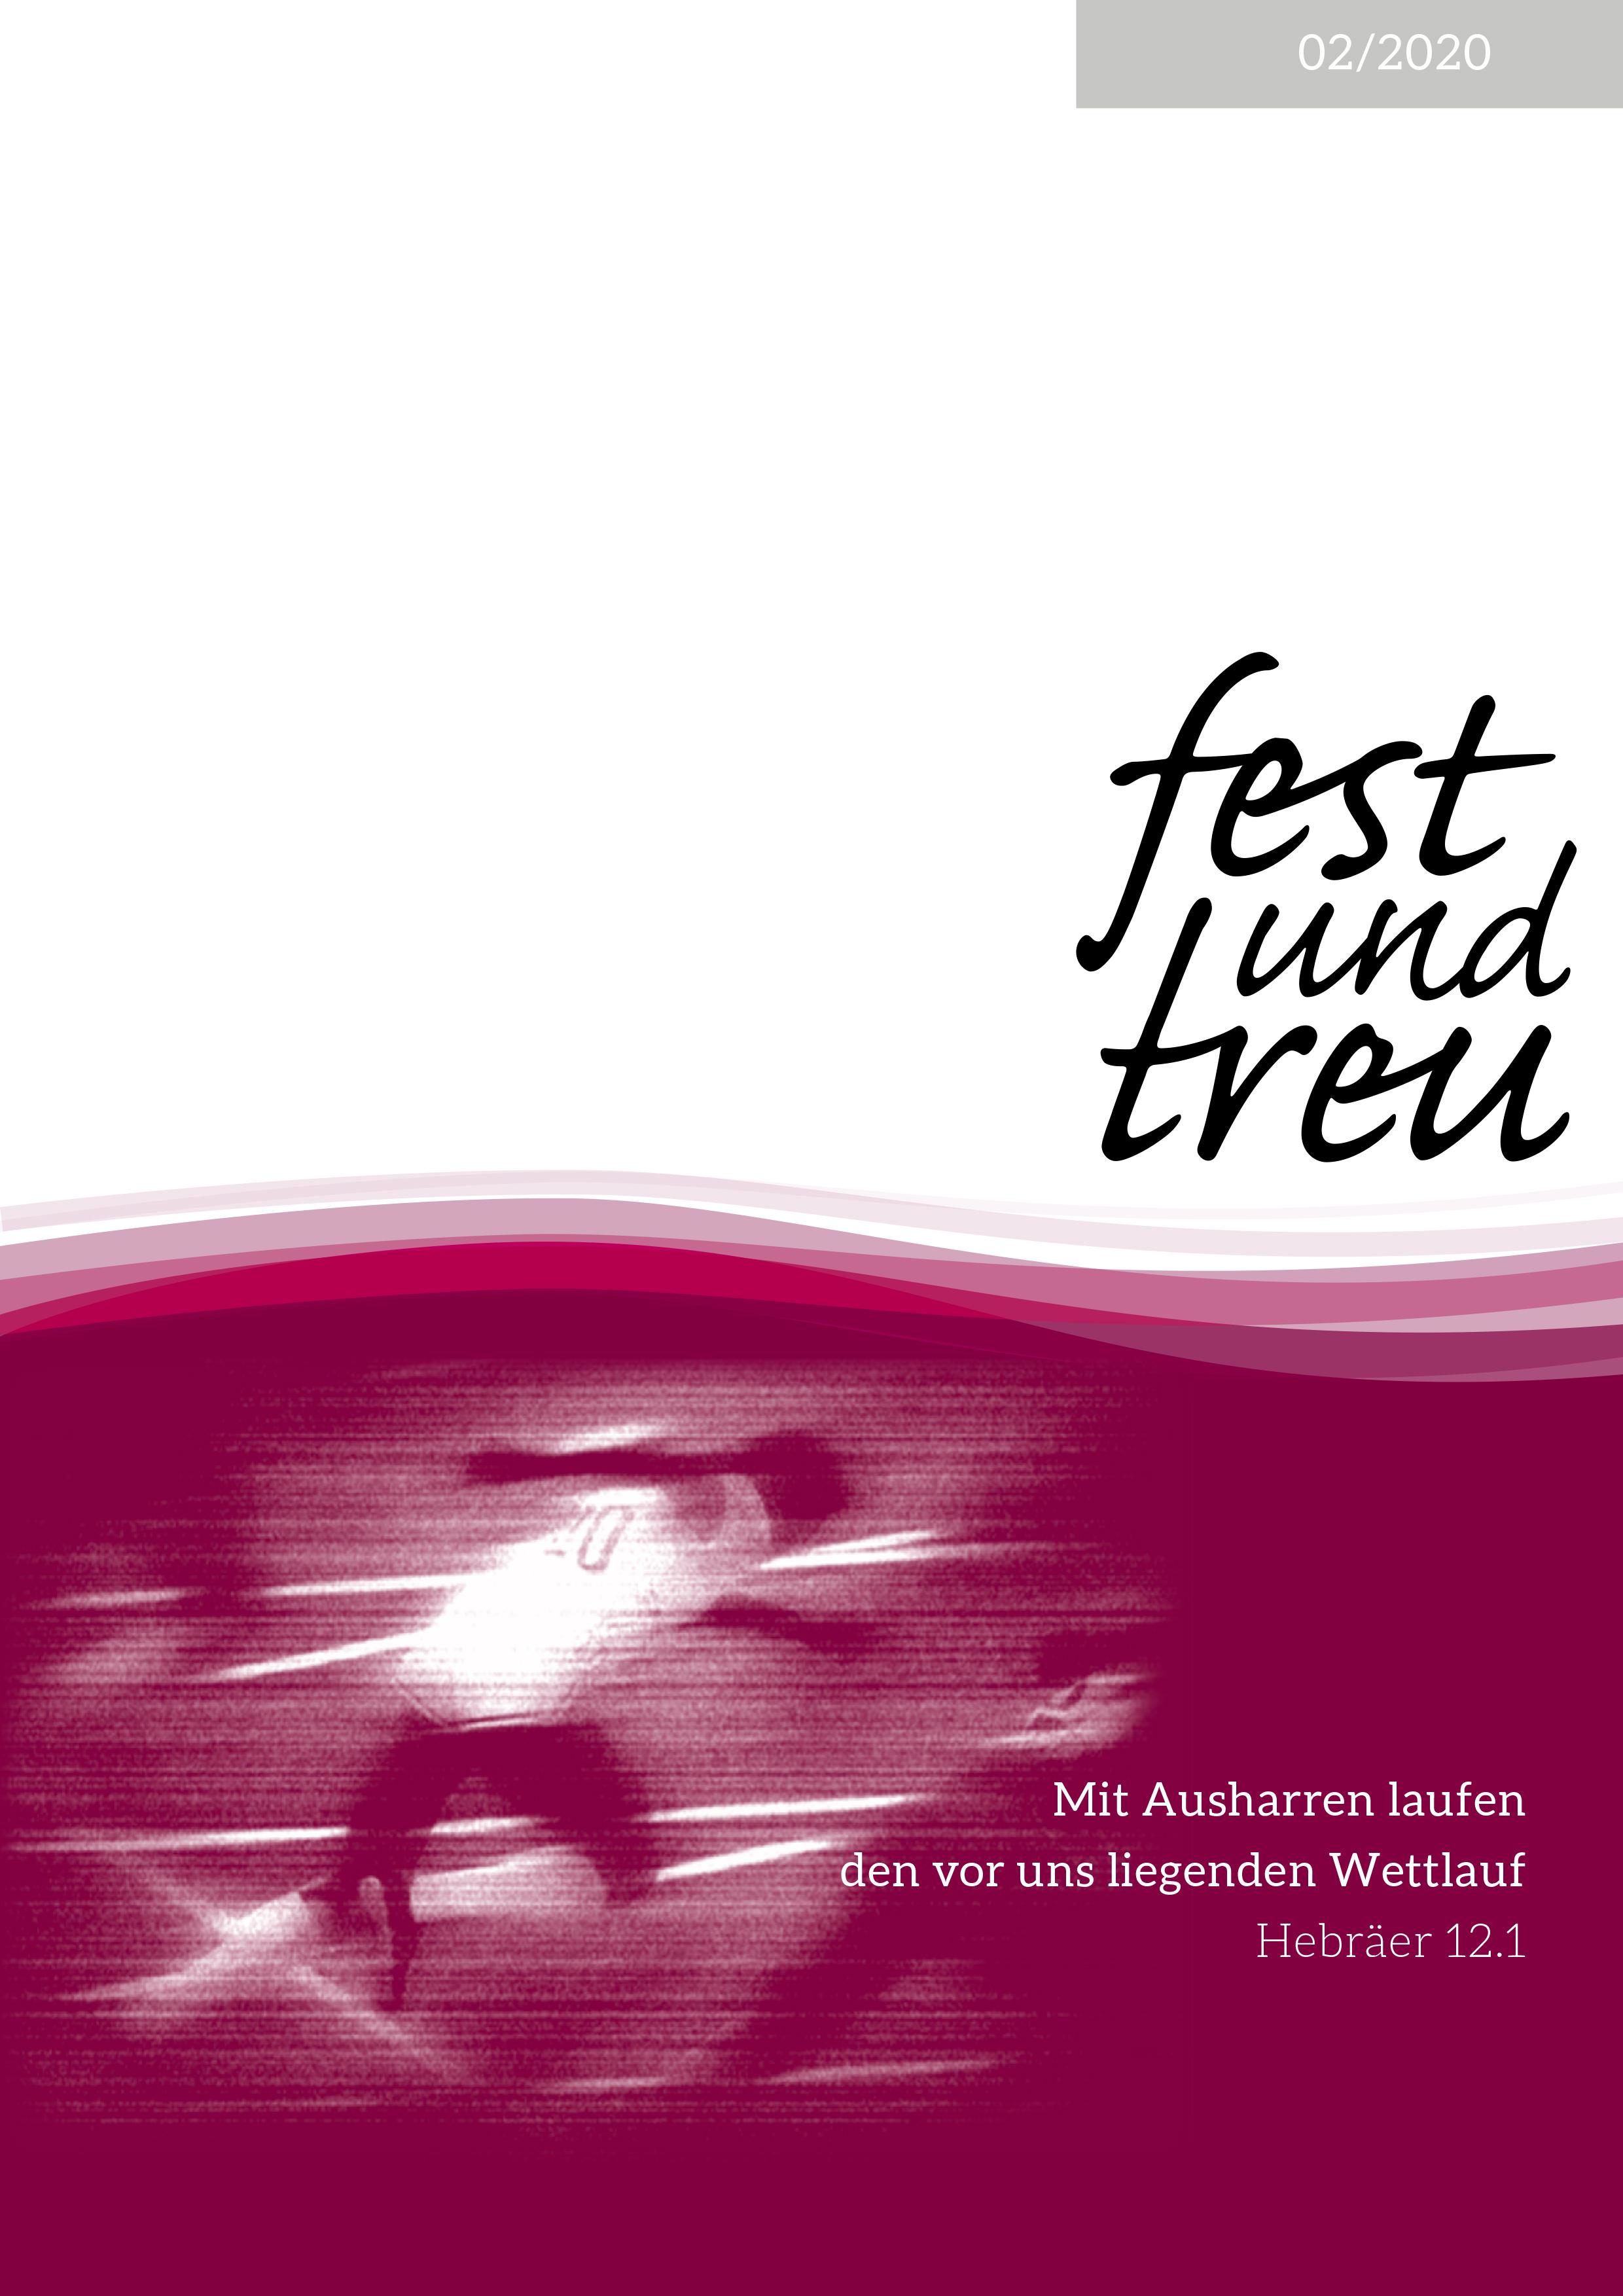 fest & treu - 2/2020